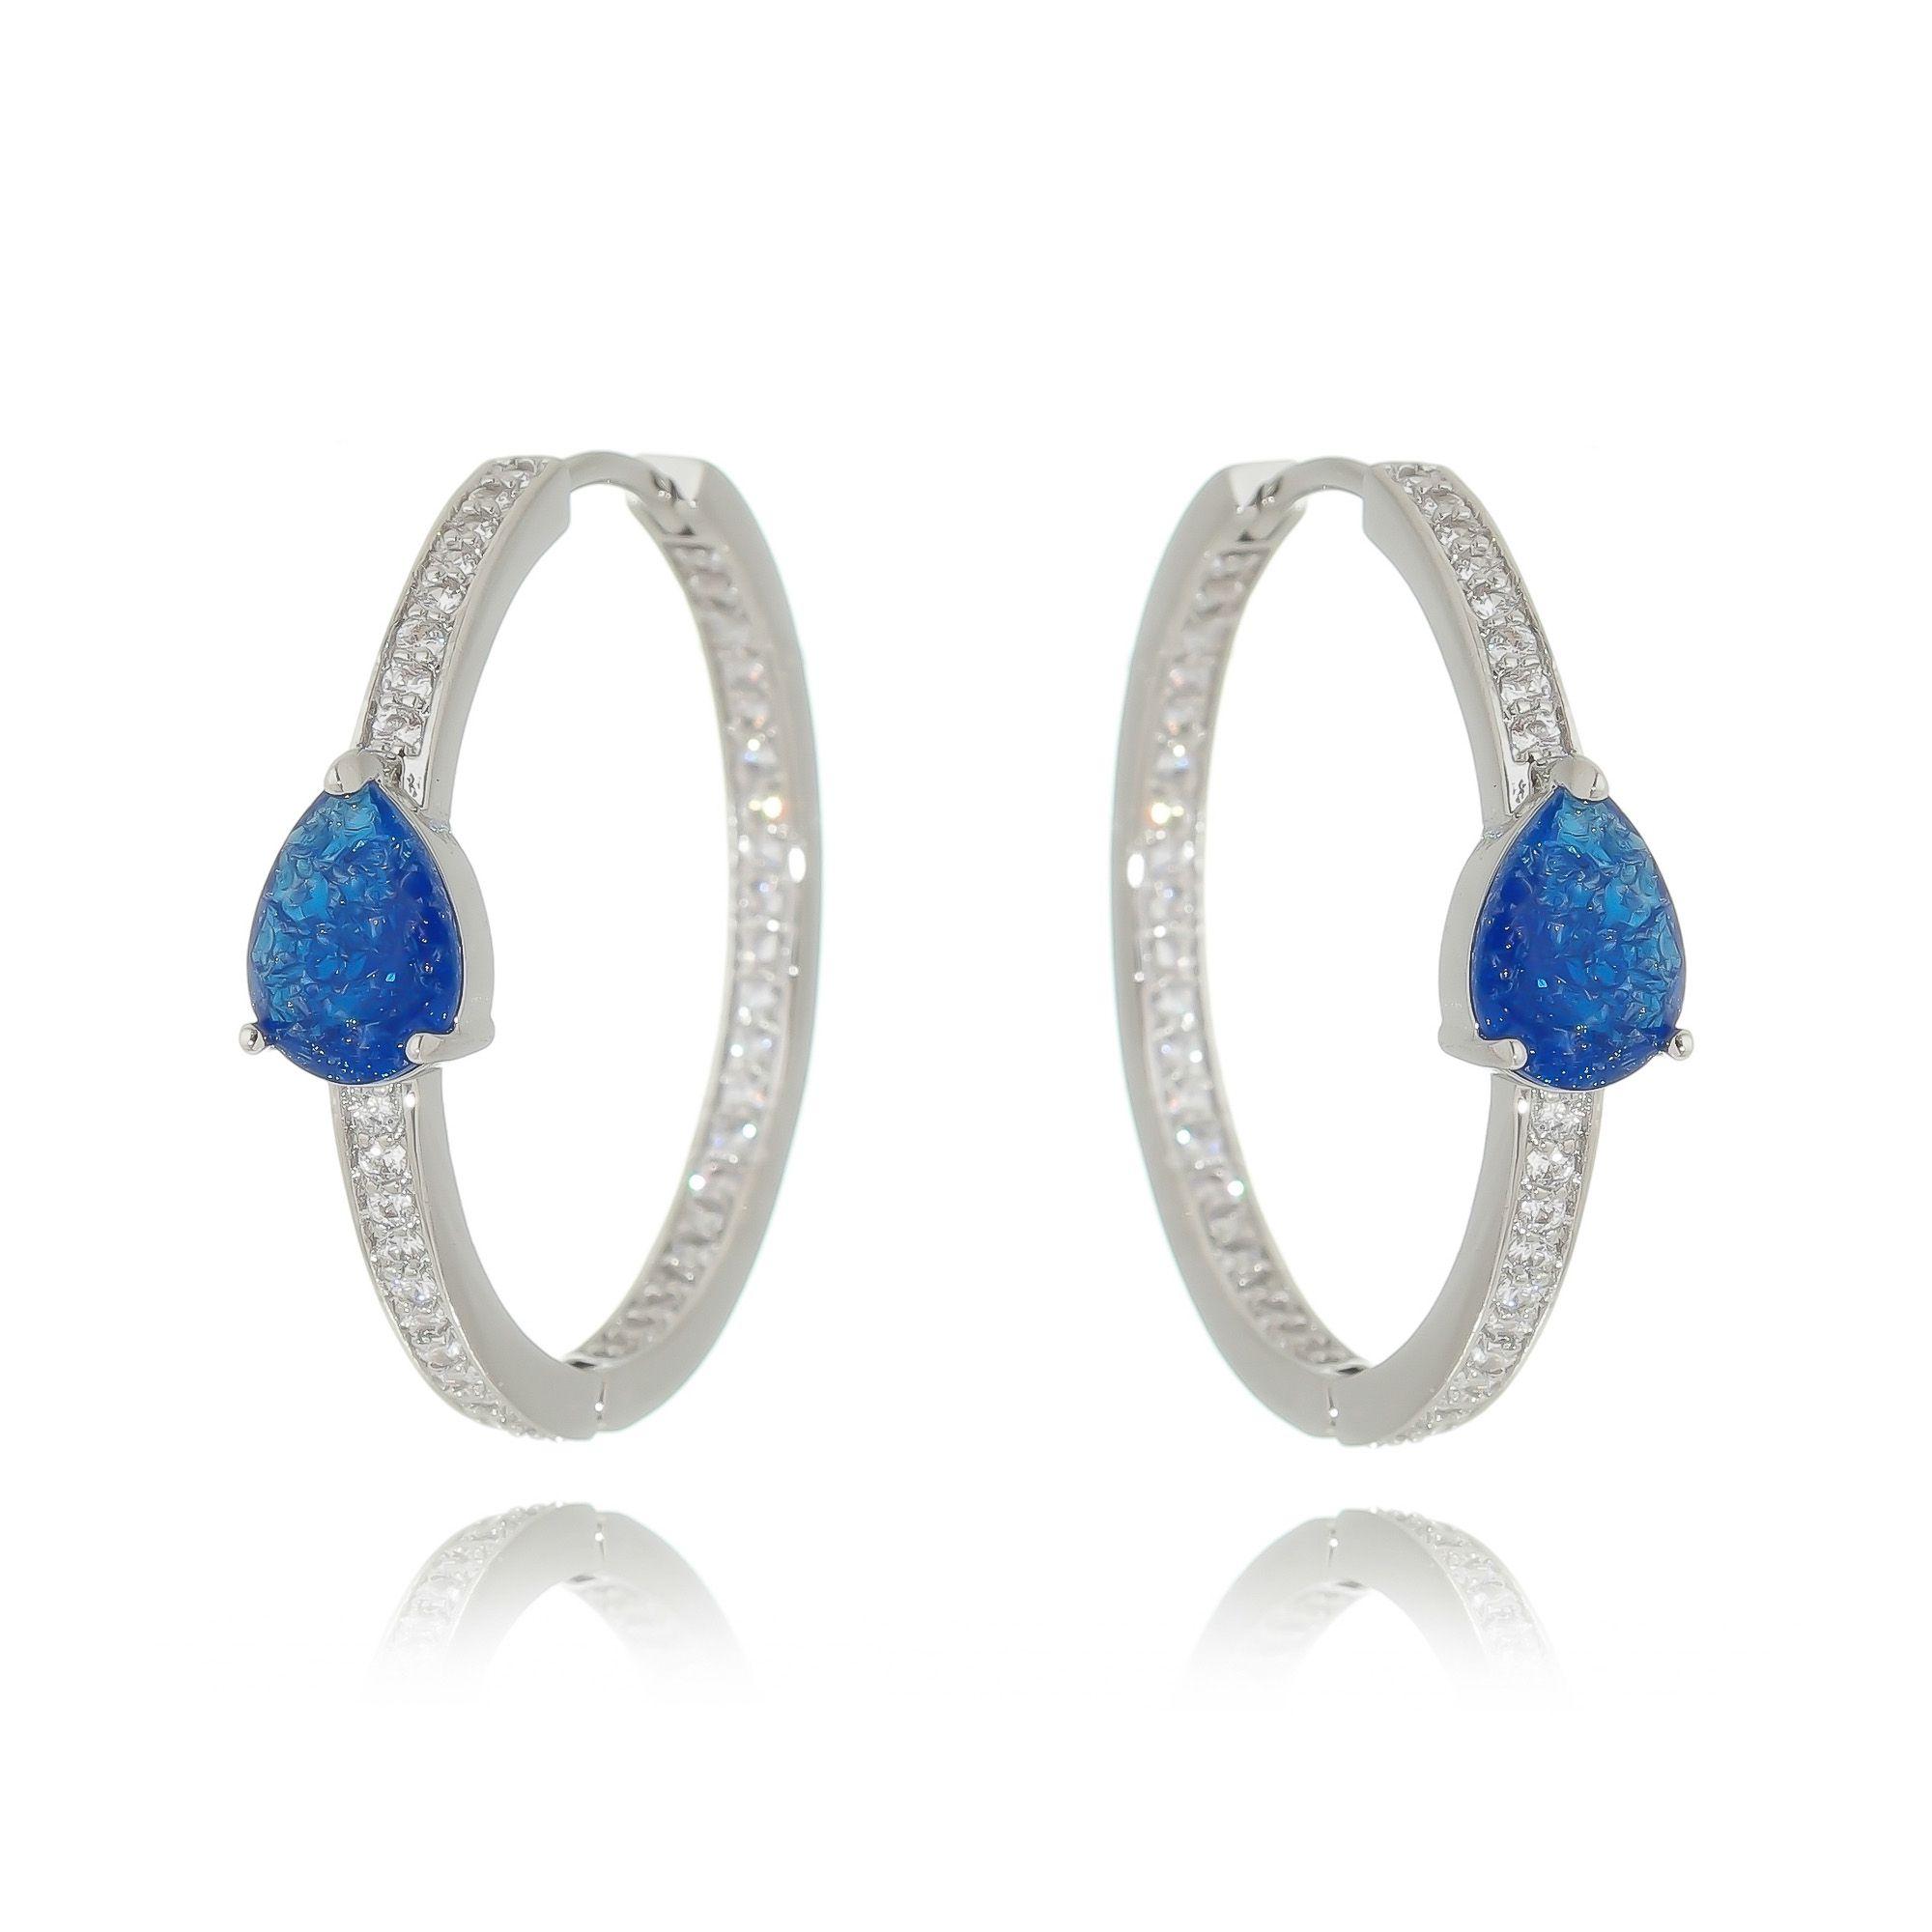 Argola Gota Fusion Azul com Zircônia Semijoia Ródio Branco  - Soloyou